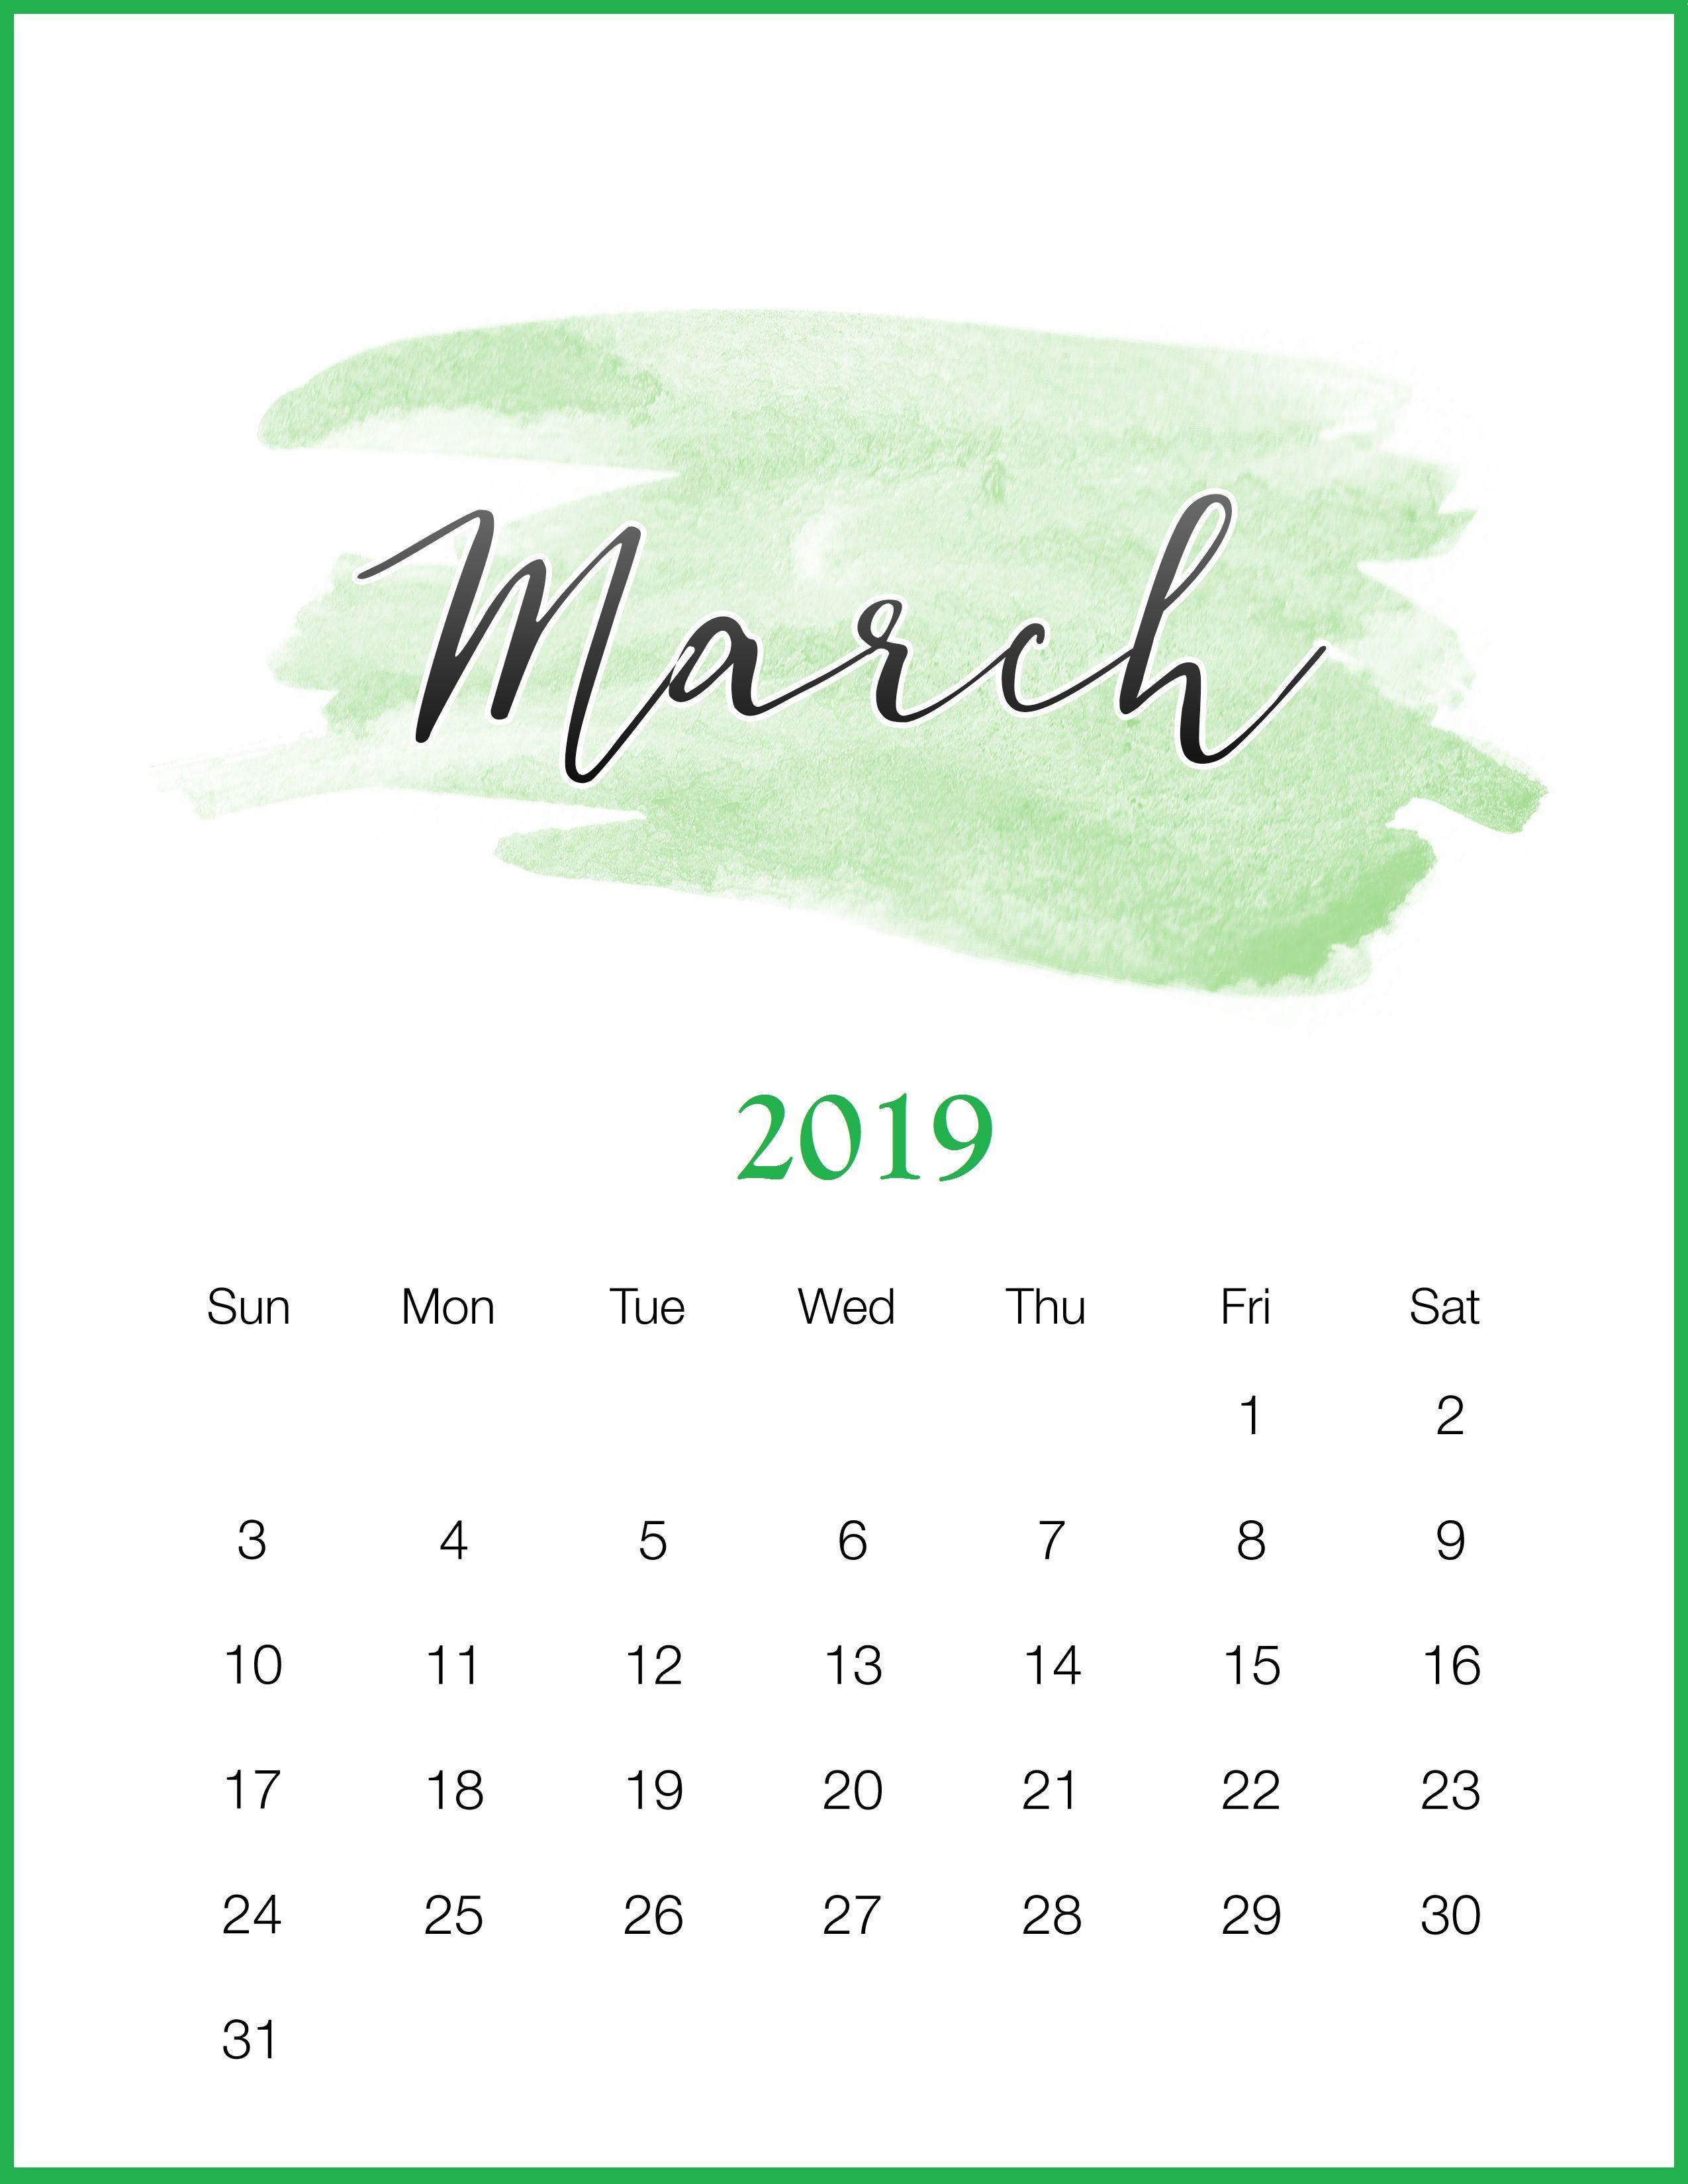 Pin By Amanda On 2019 Pinterest Calendar 2019 Calendar And